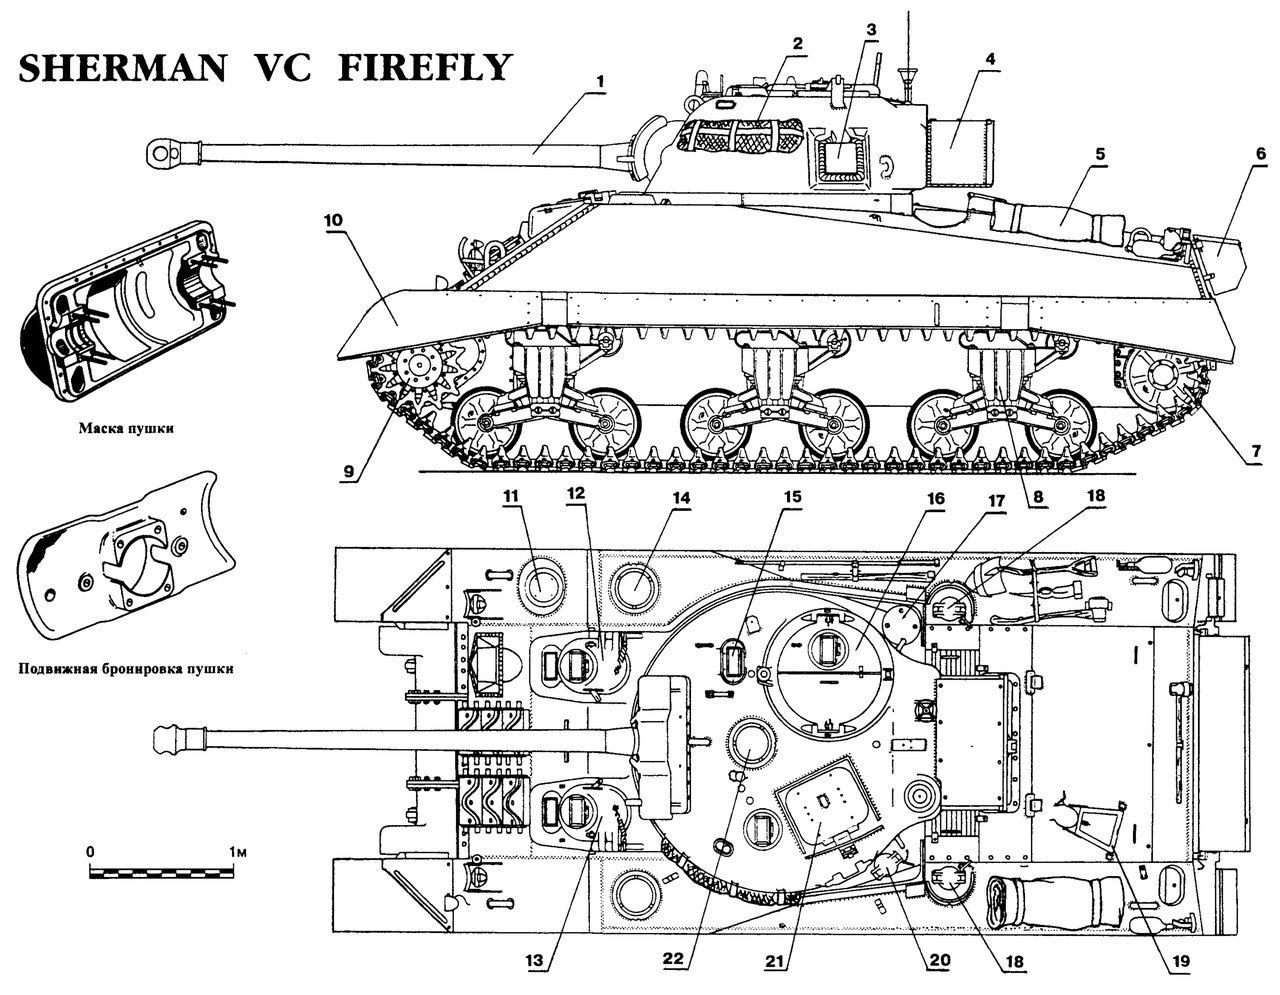 sherman_firefly_history